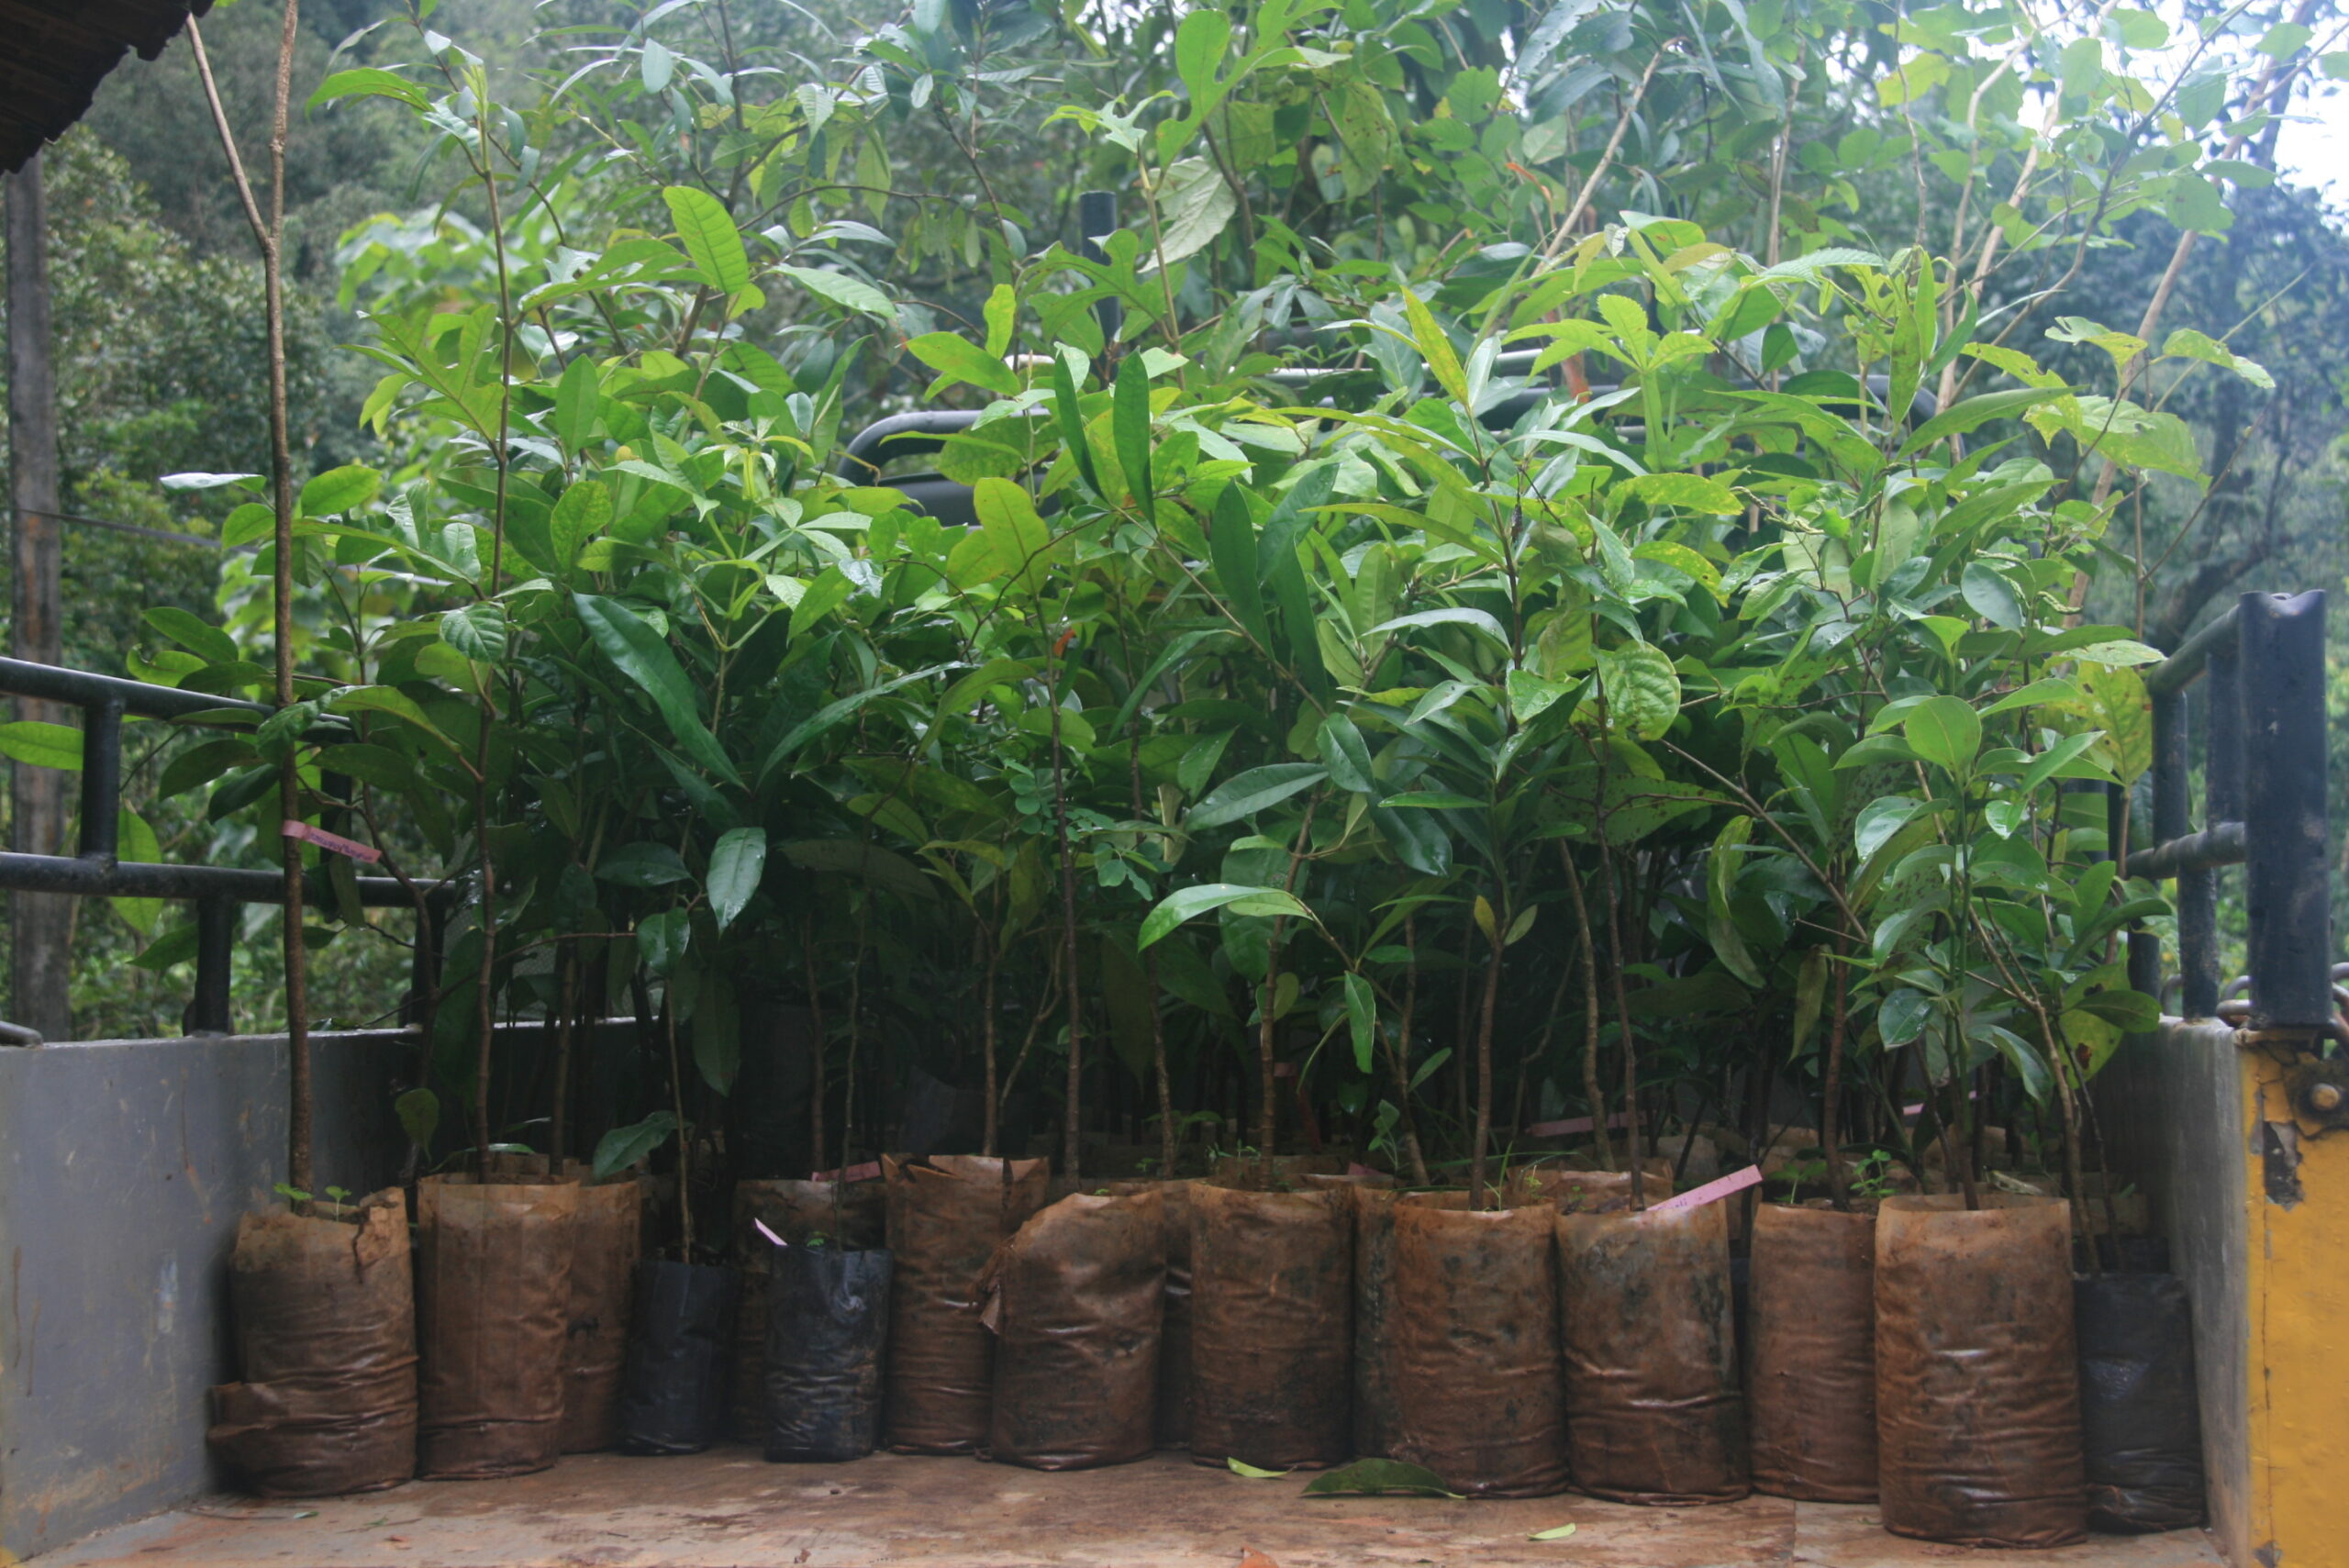 22nd Aug 2015 200 Sapling Planting